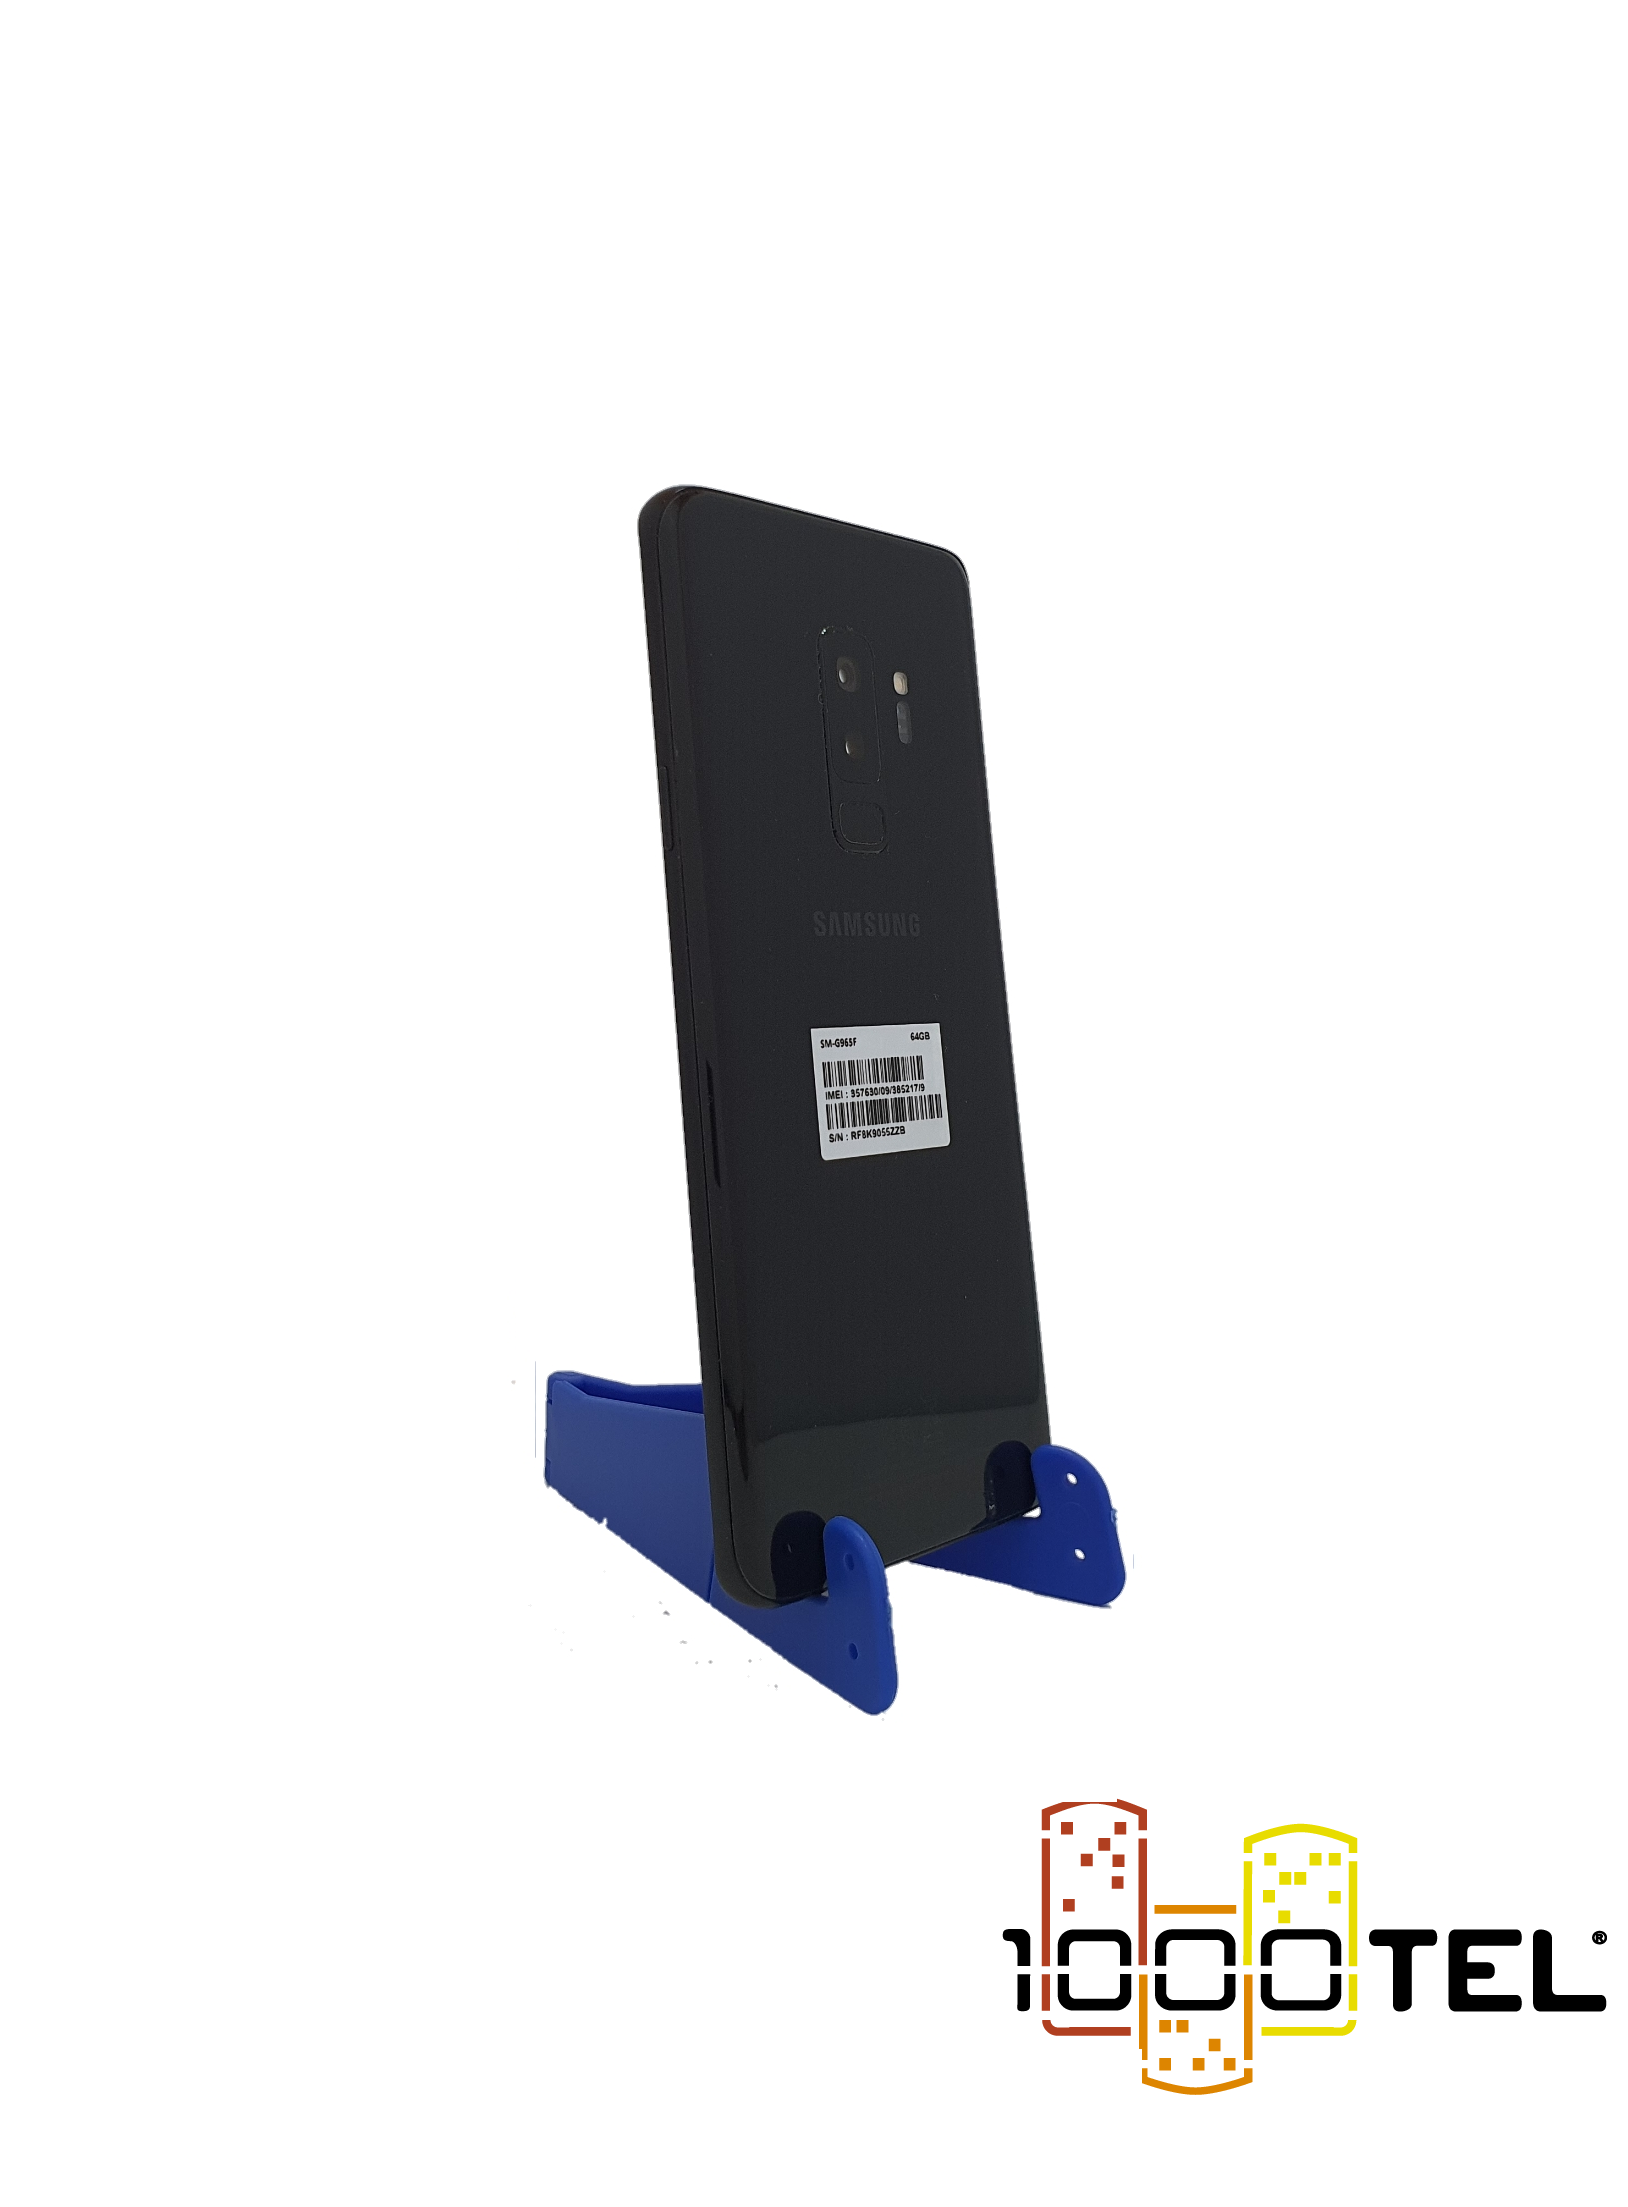 Samsung Galaxy S9 Plus 64GB #3